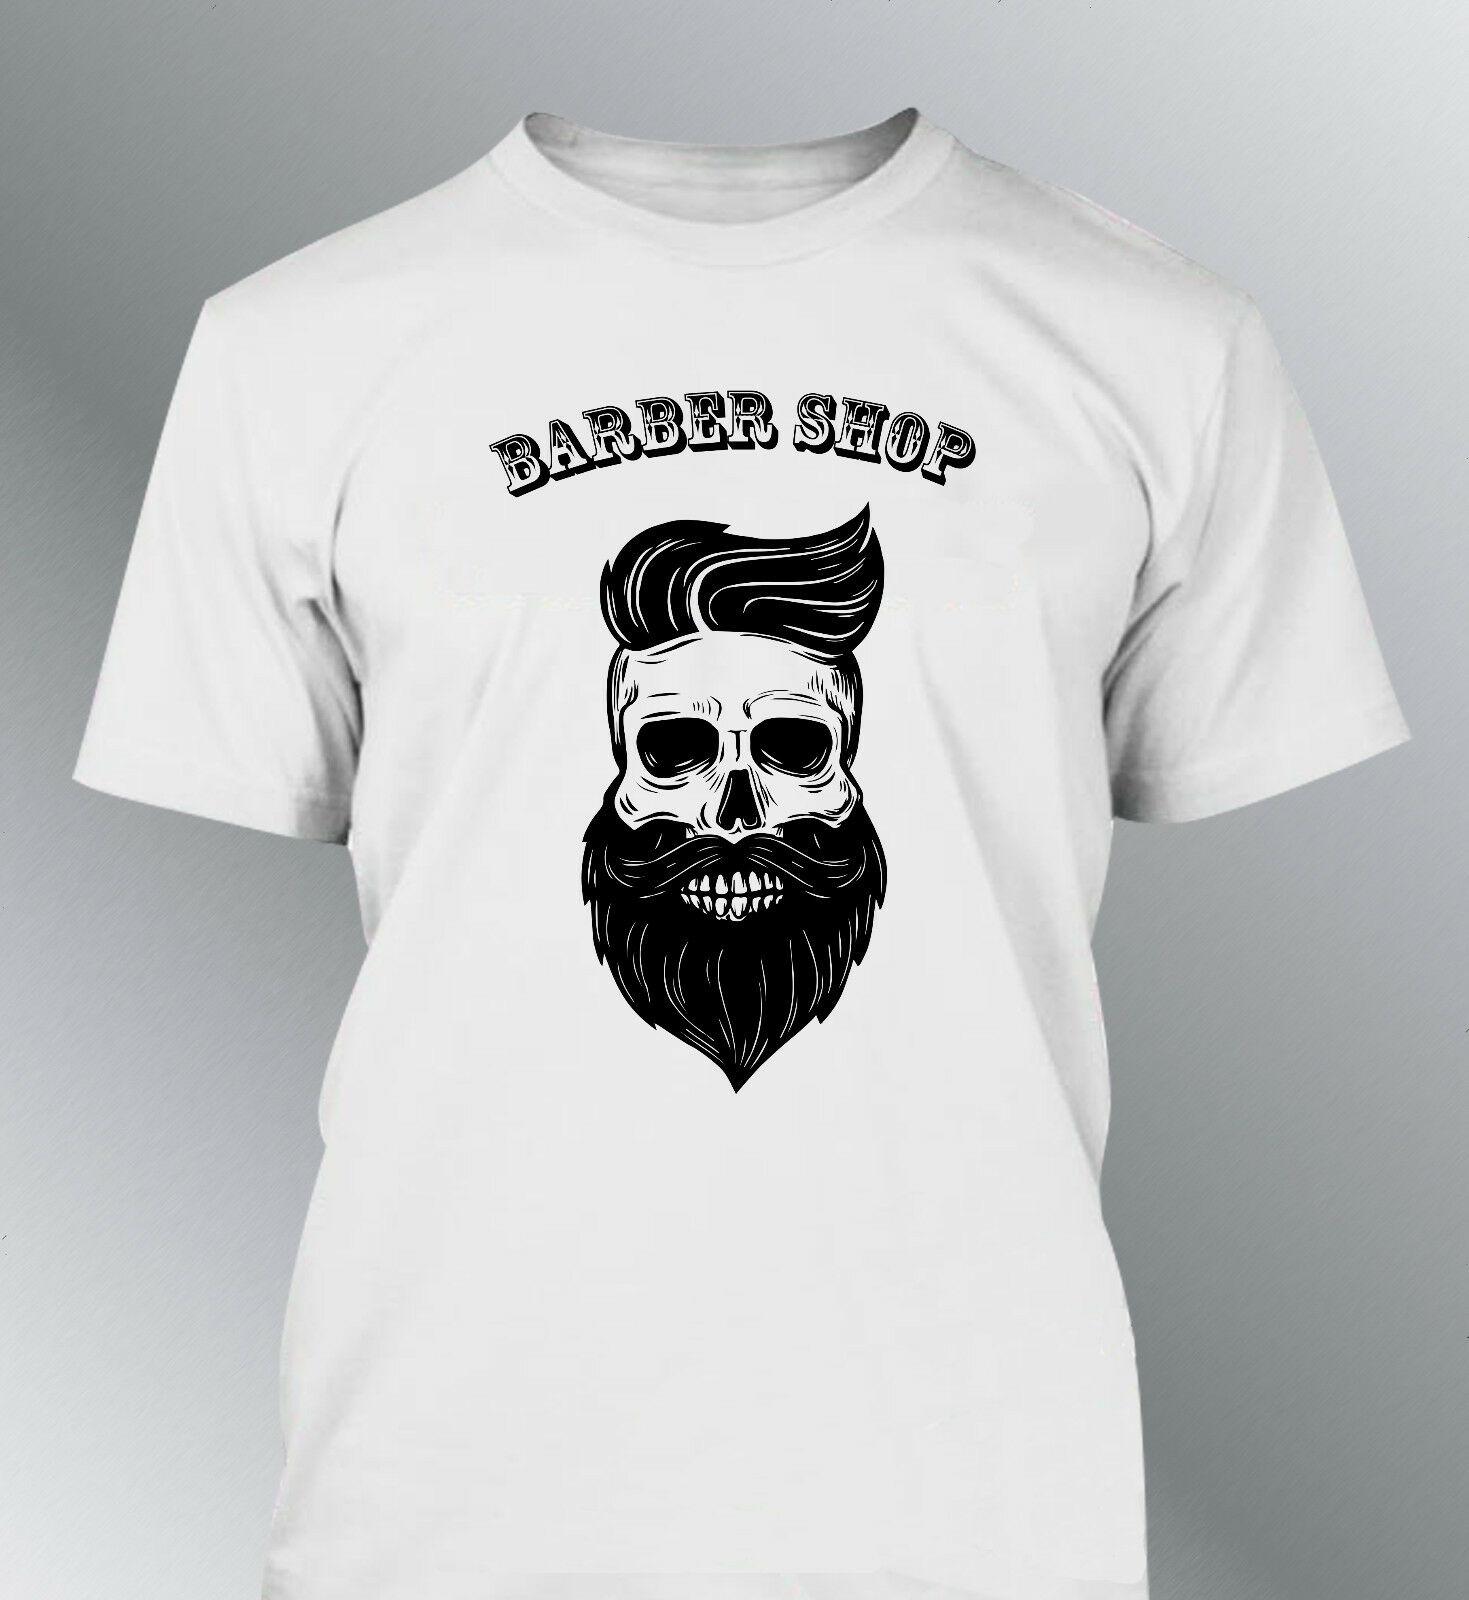 T Hemd Homme Hipster Schädel Tete De Mort Barbu Barber Shop Barbe Neue Männer Mode Top T Freies Verschiffen Hüfte hop T Hemd